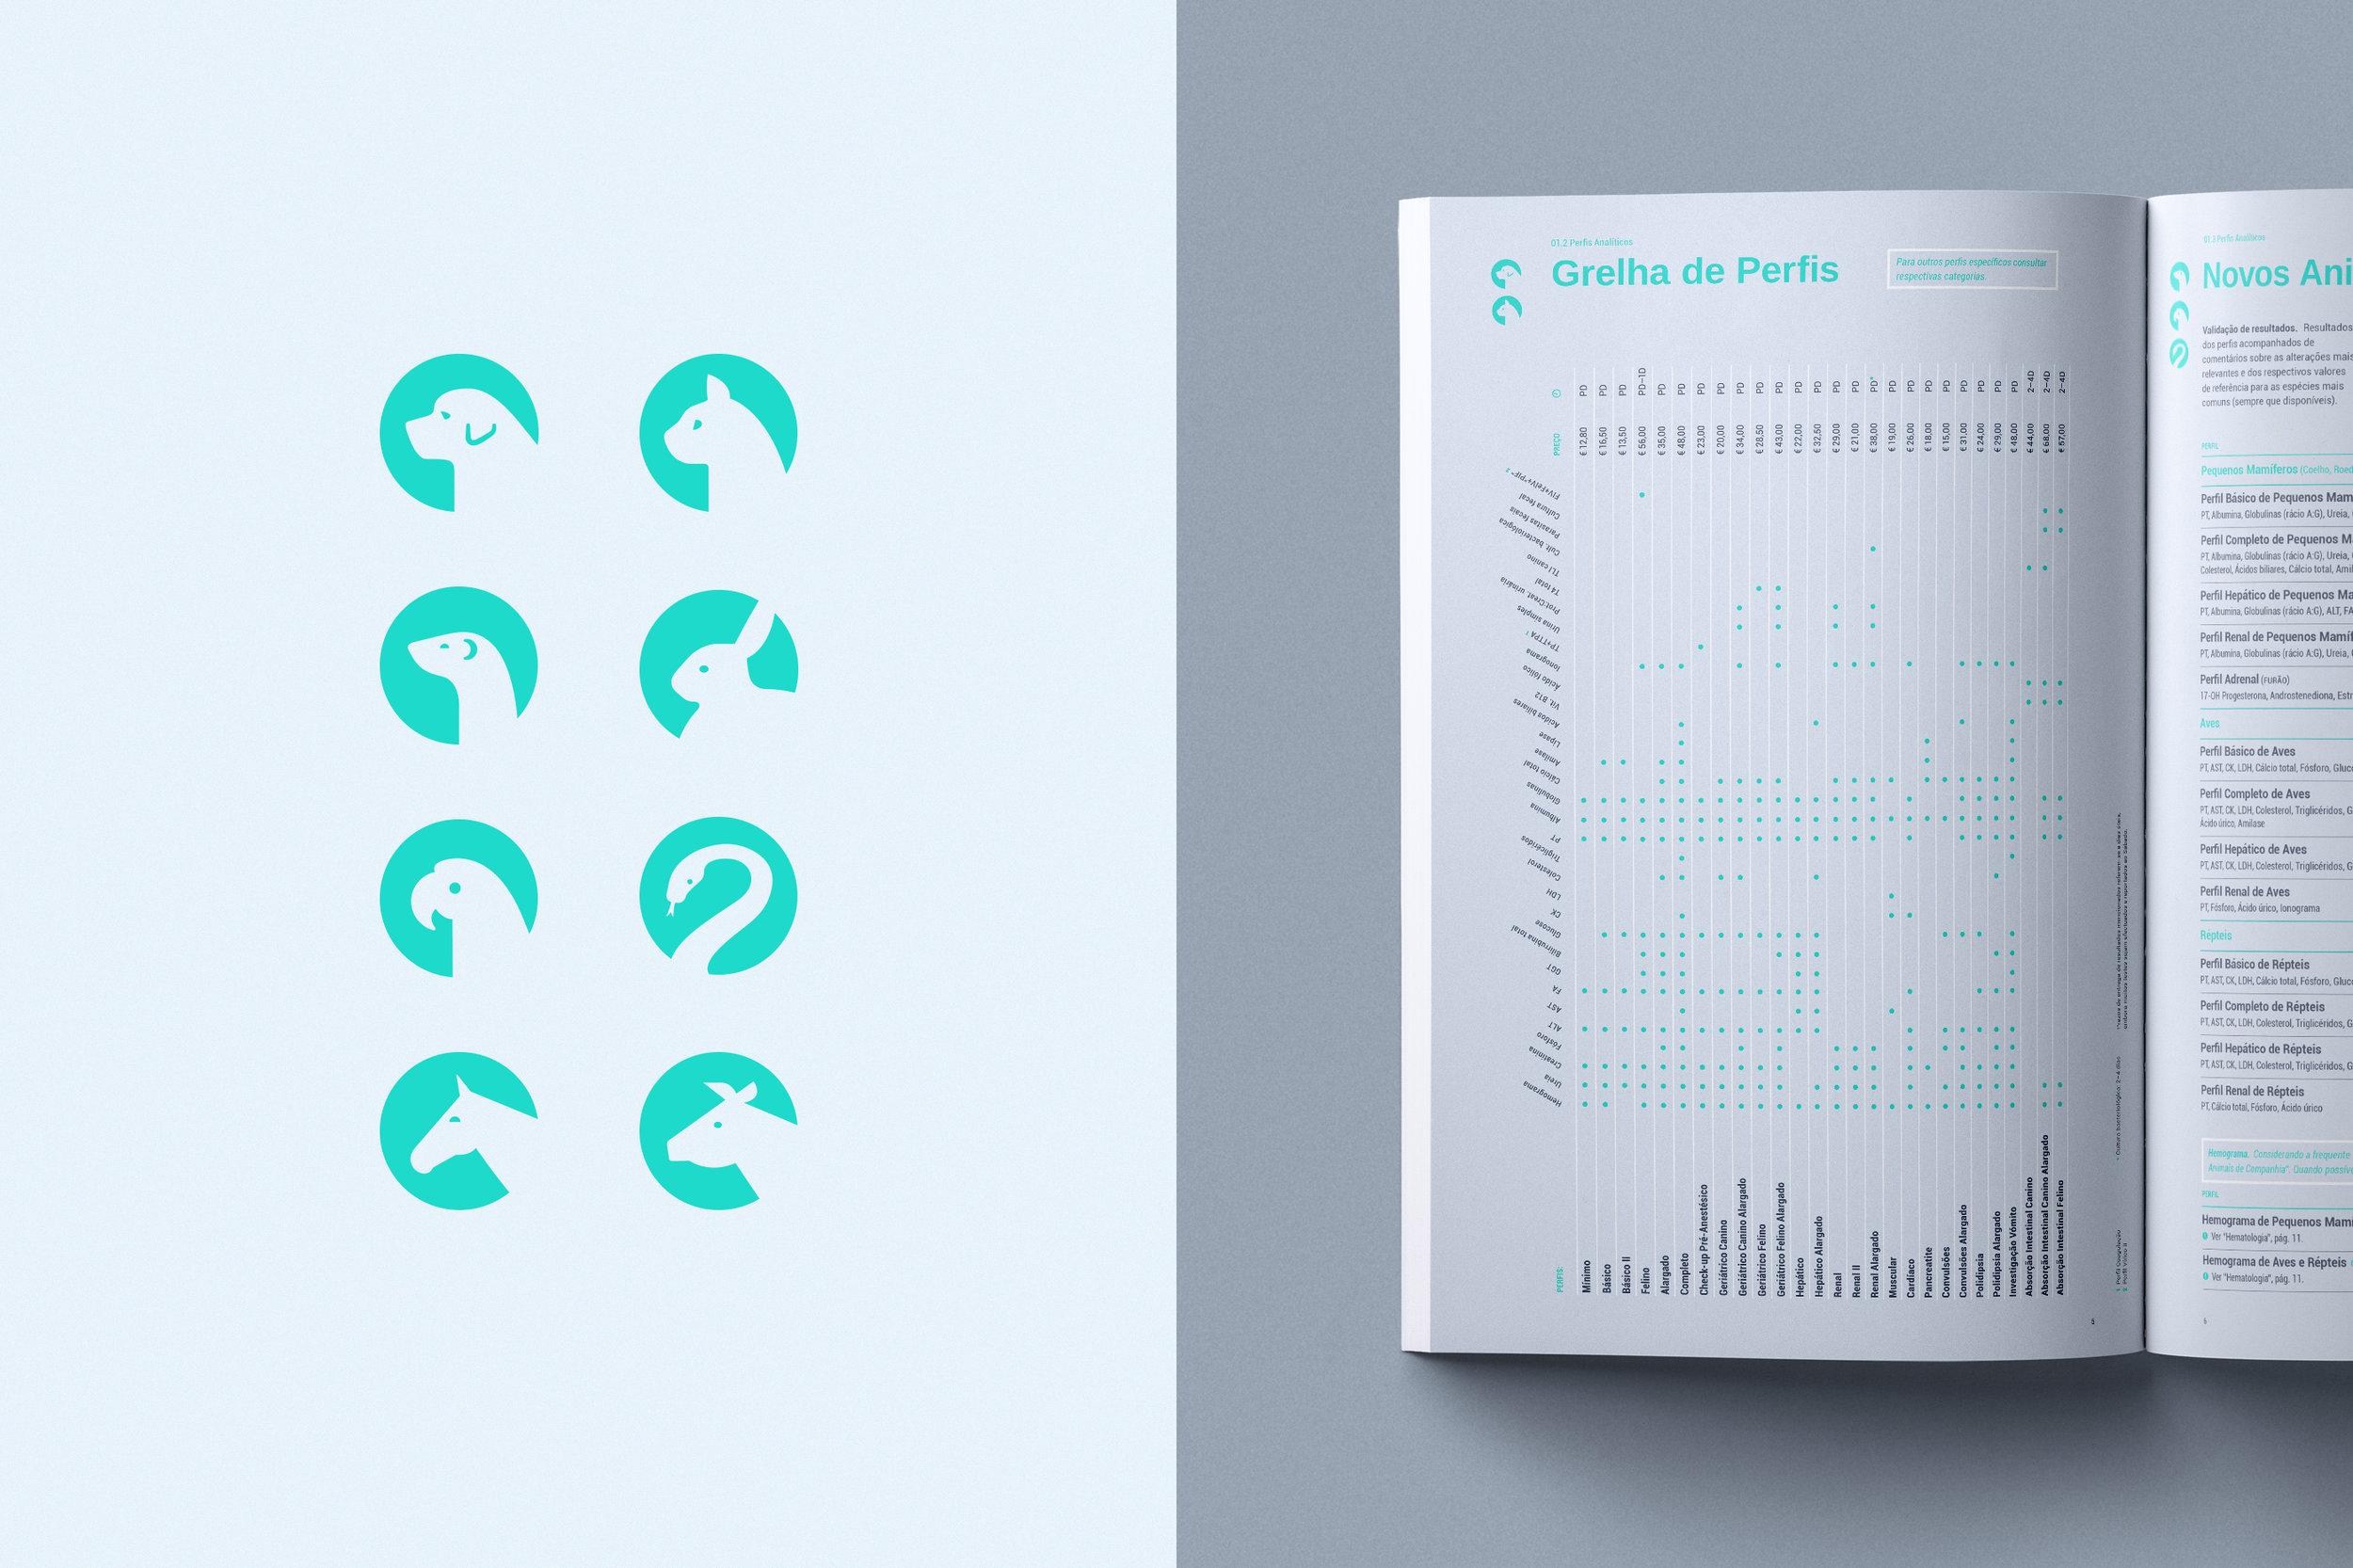 Cedivet+Veterinary+Lab+identity+by+Gen+design+studio-5.jpg